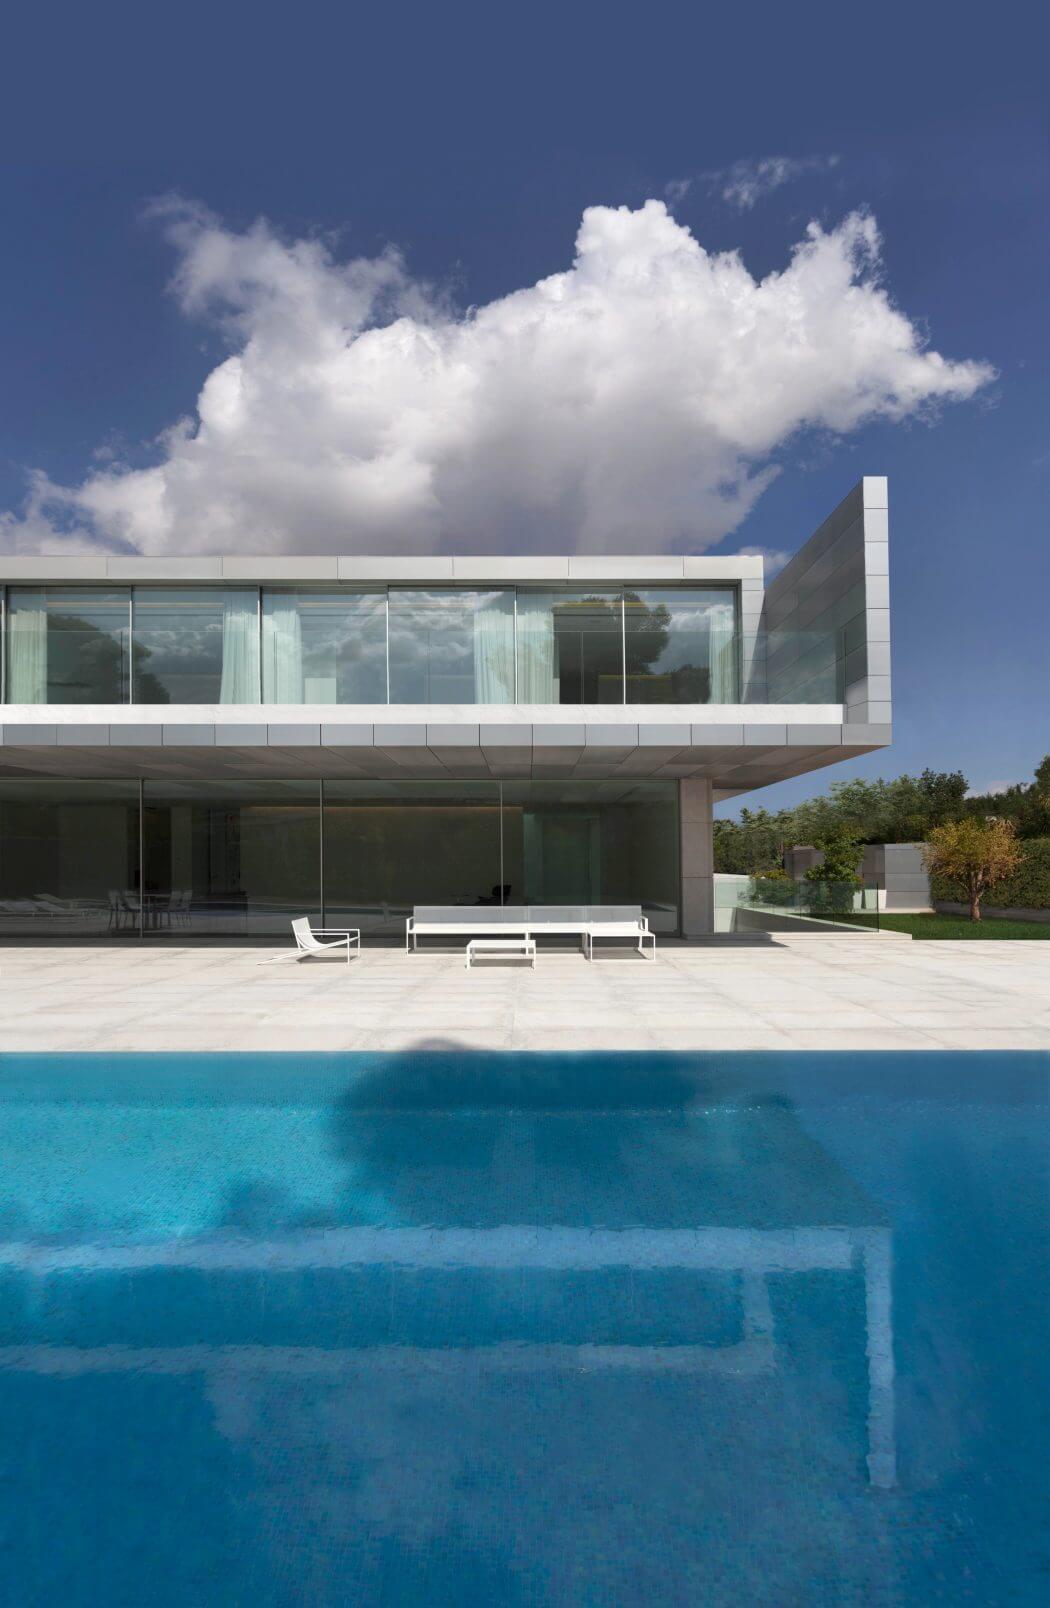 Aluminum House by Fran Silvestre Arquitectos